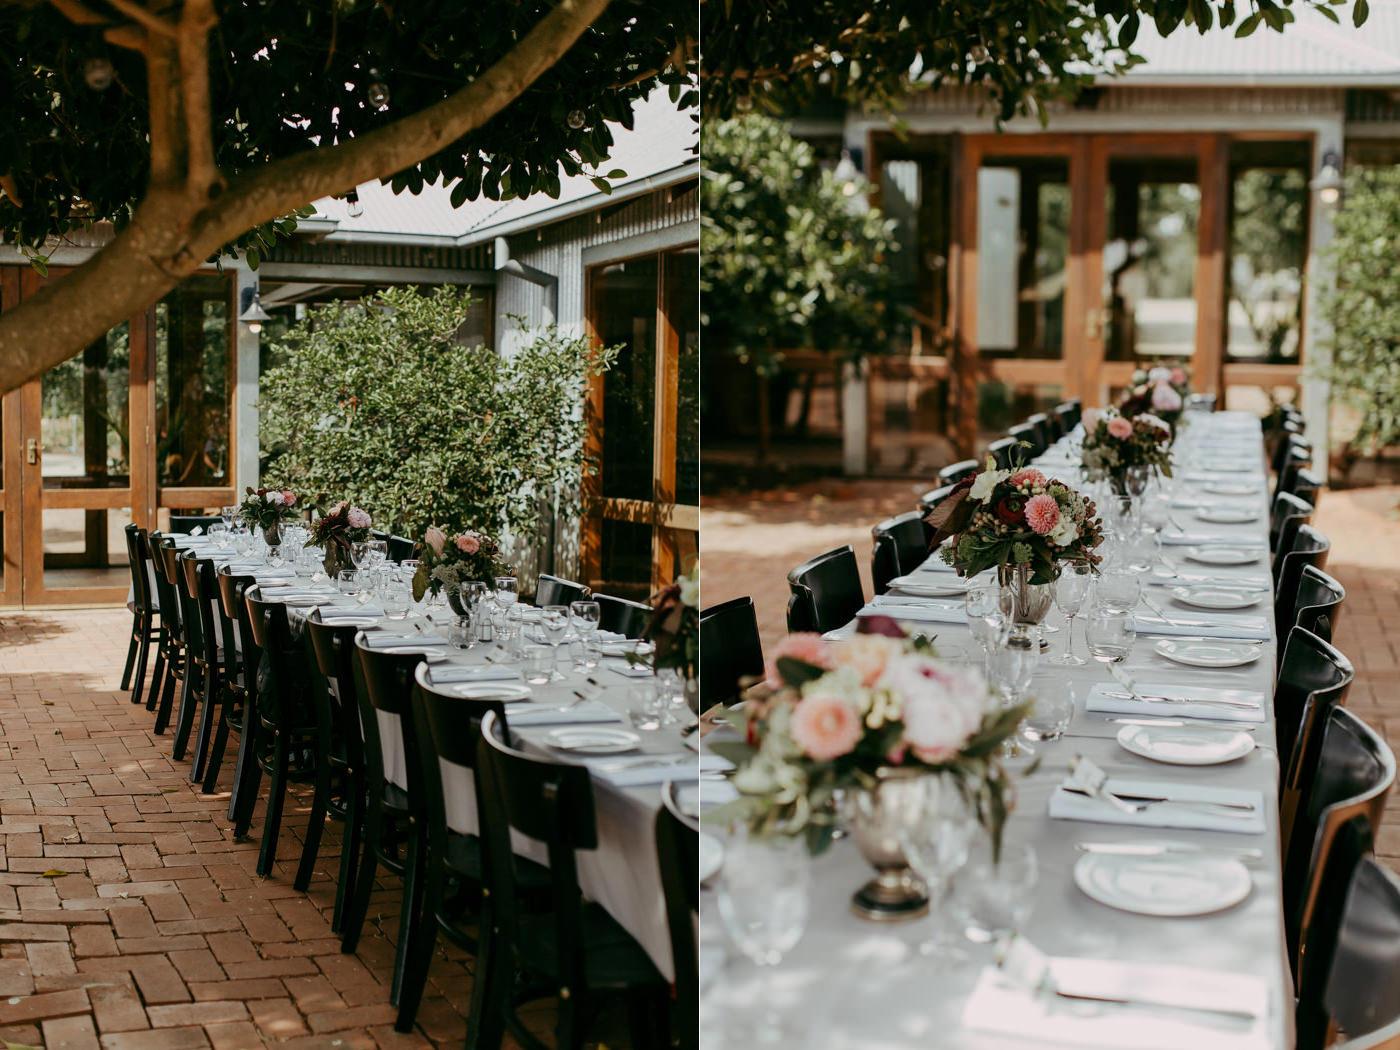 Anthony & Eliet - Wagga Wagga Wedding - Country NSW - Samantha Heather Photography-84.jpg